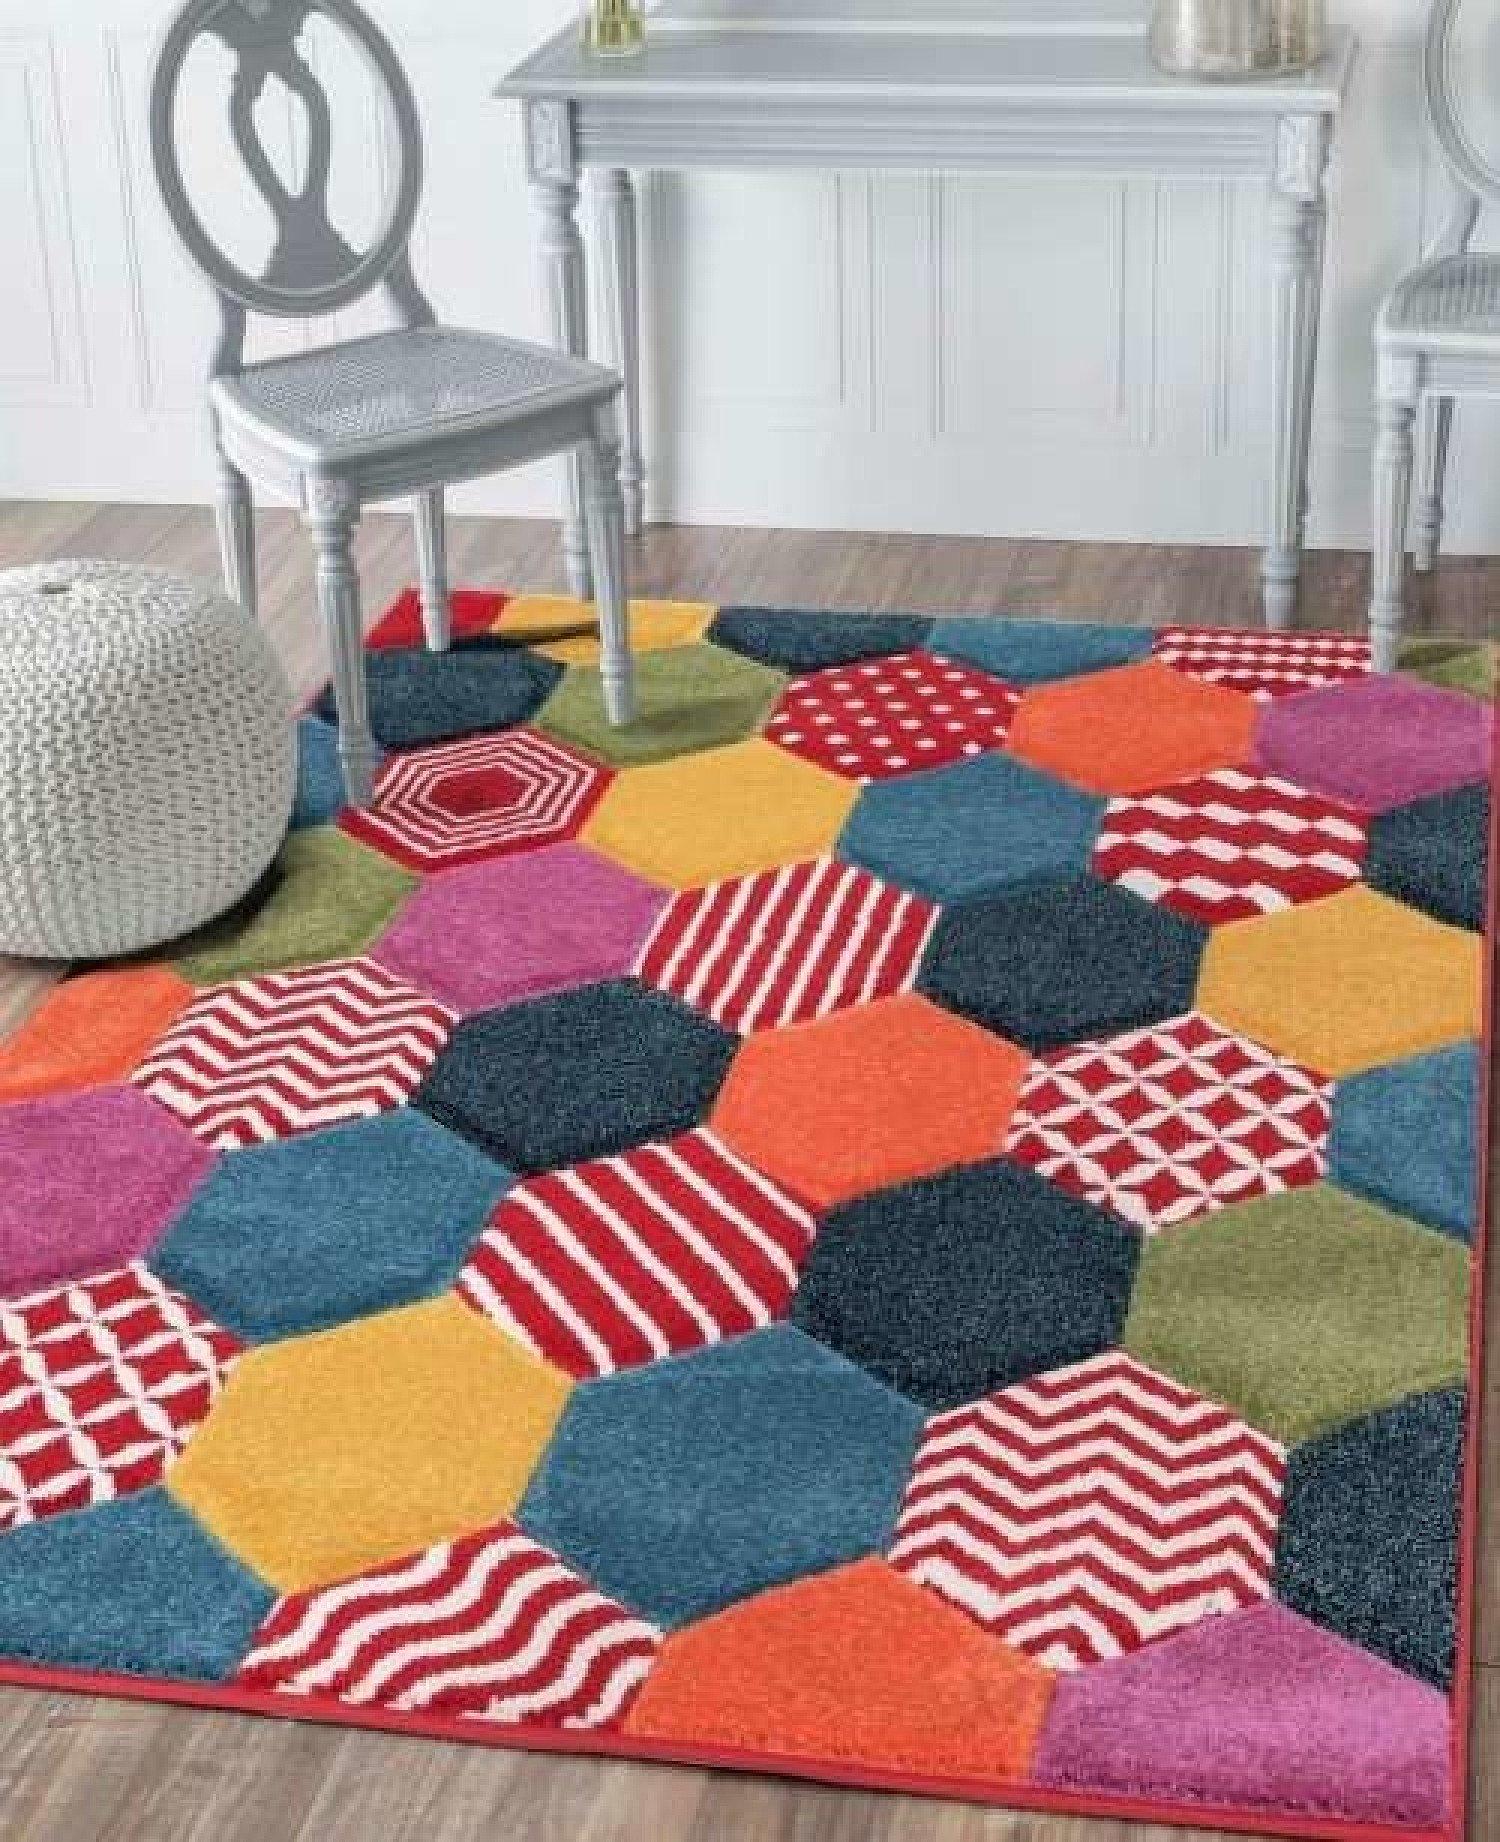 Chicago Hexagon - Multi Coloured Rug Free Postage